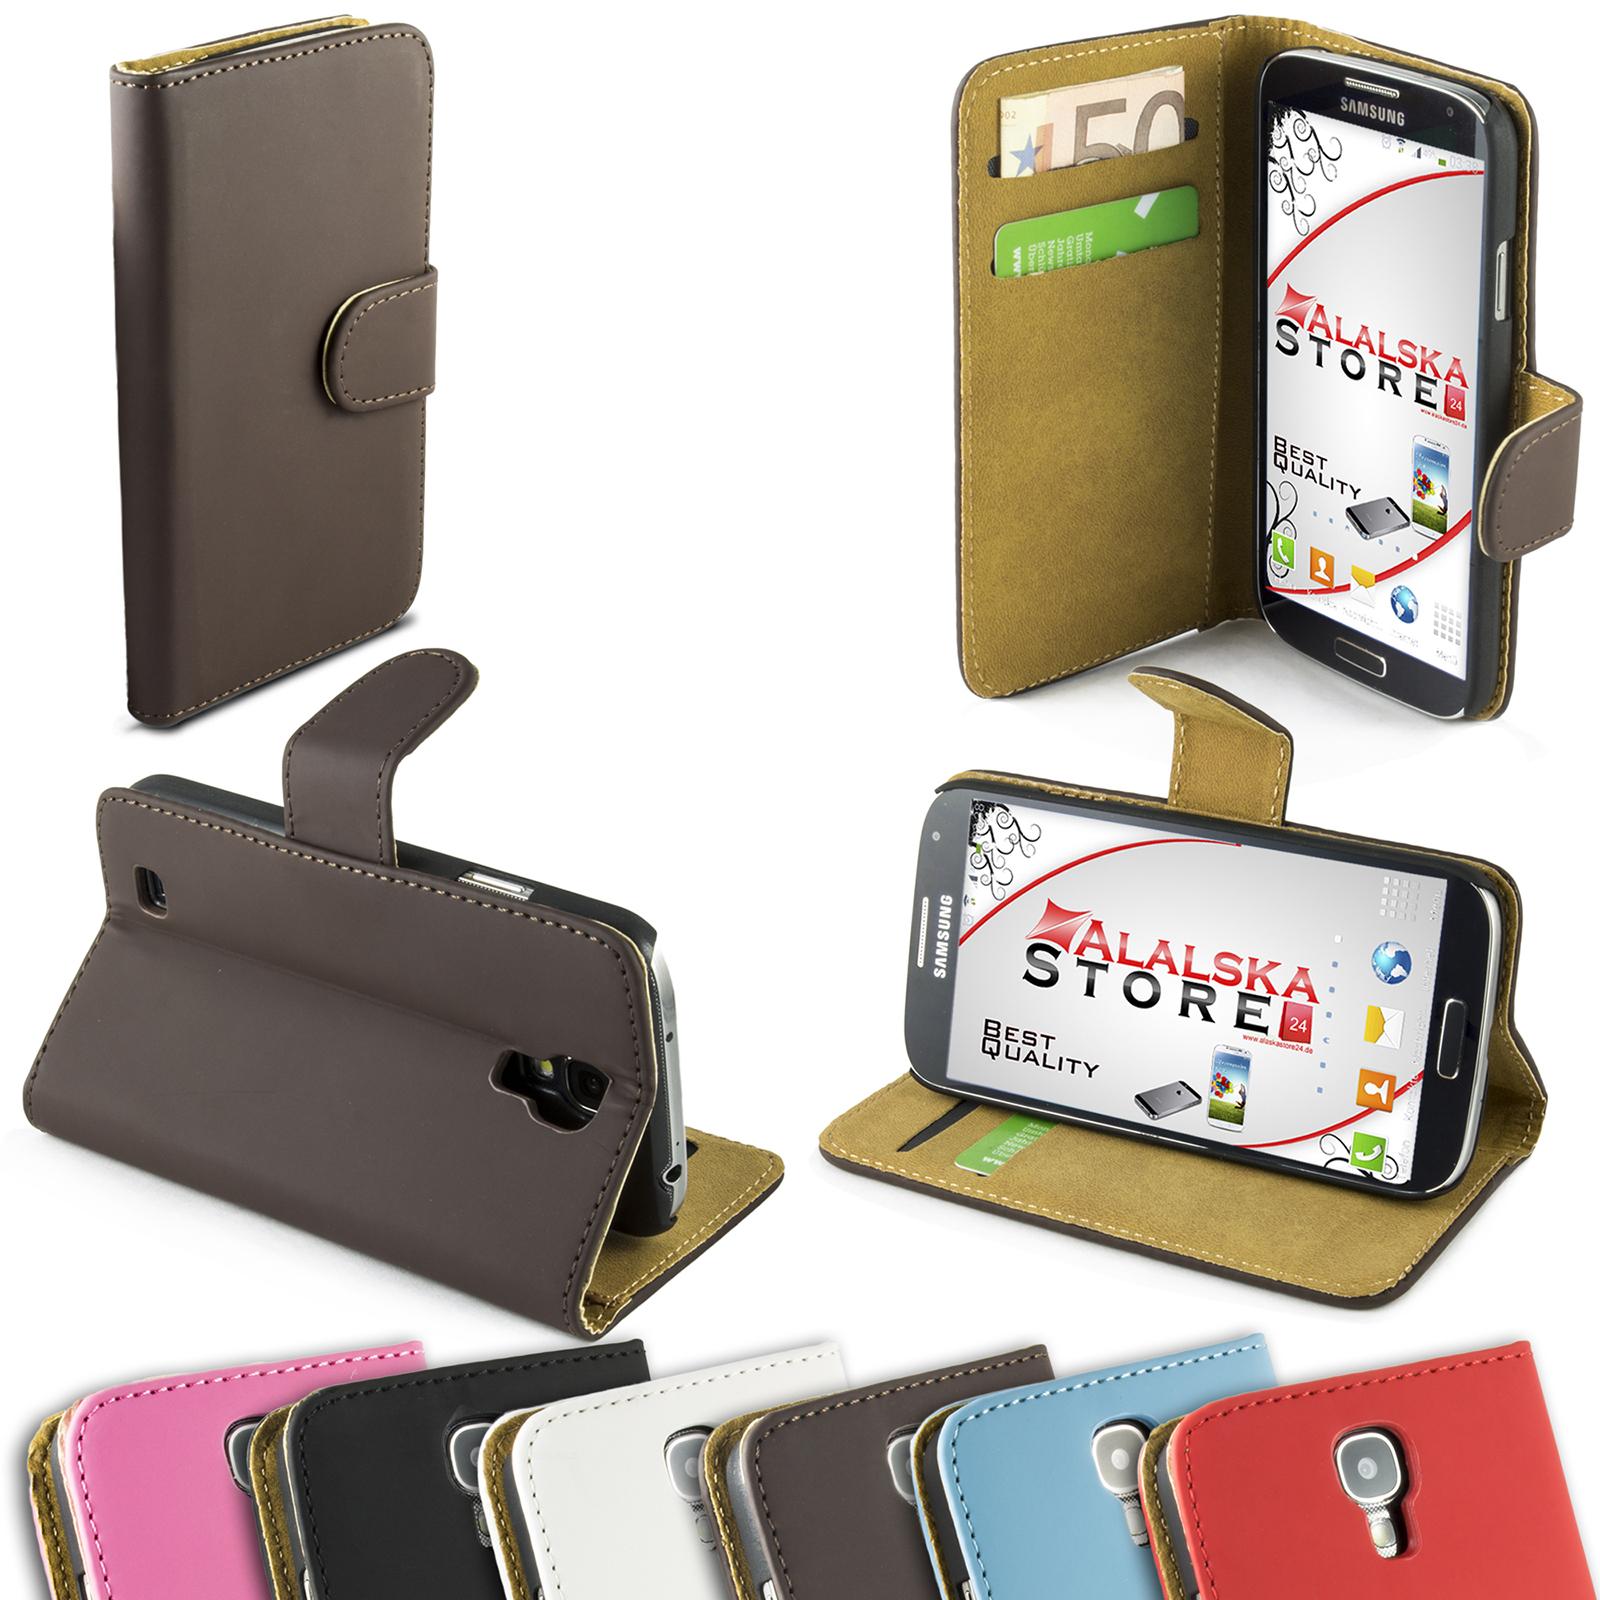 Braun-Case-fuer-Samsung-Galaxy-S4-GT-i9500-GT-i9505-Matt-Schale